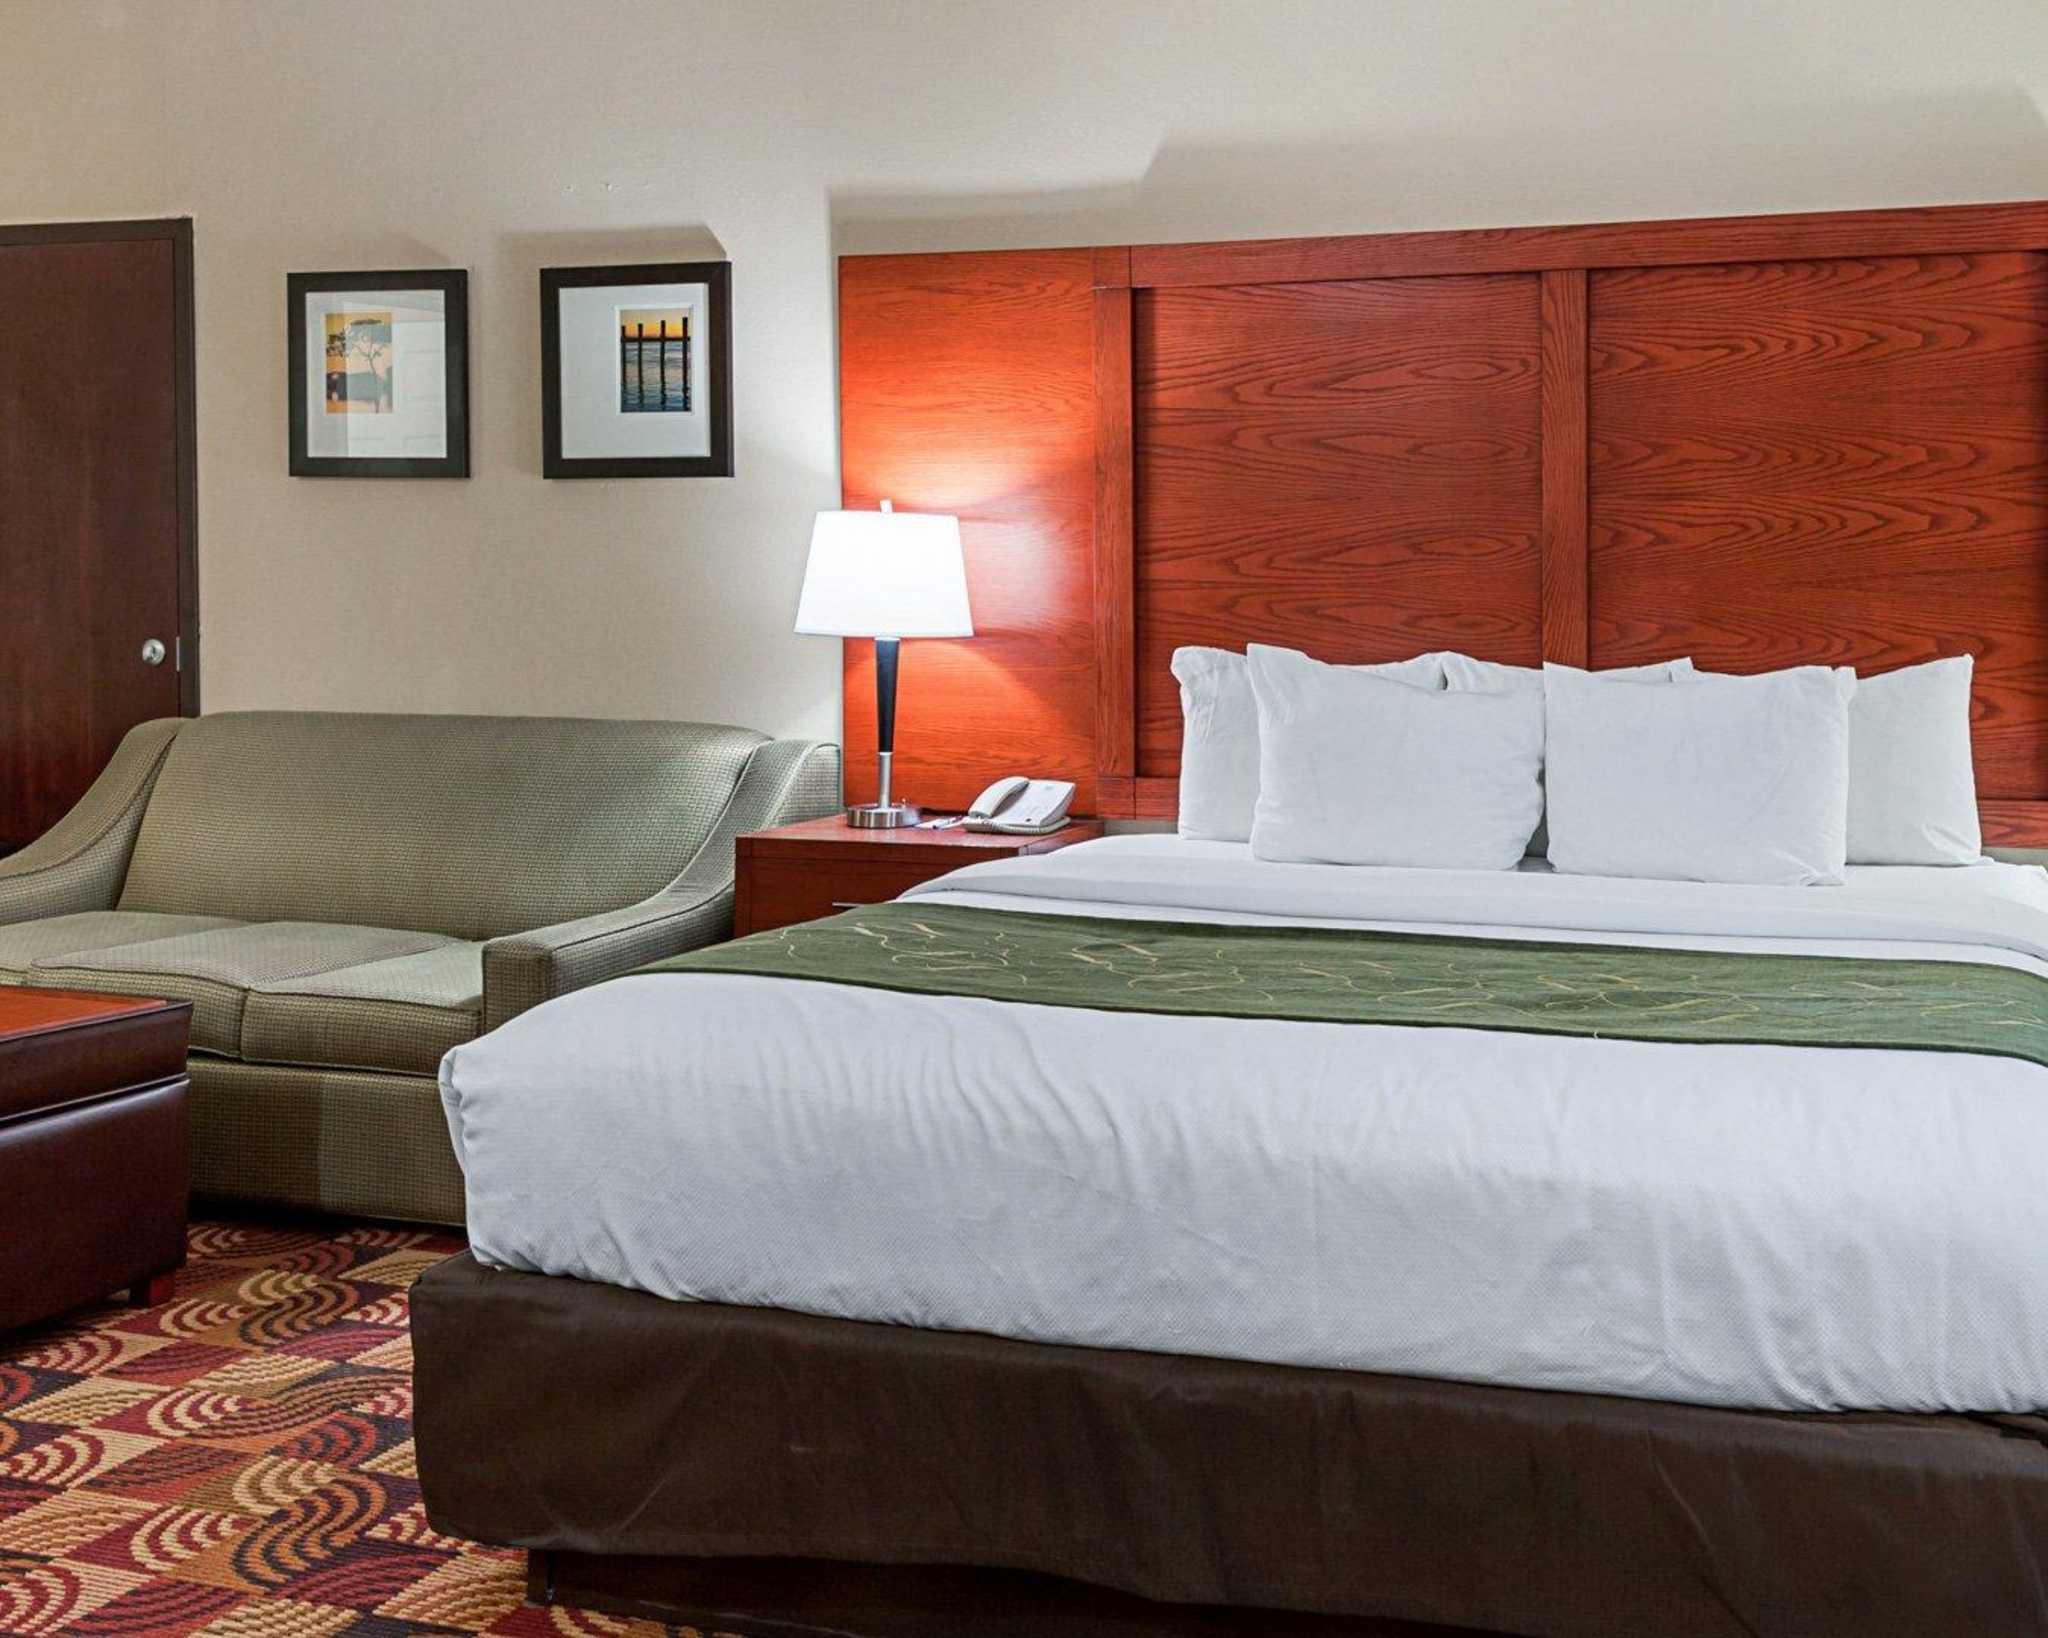 Comfort Suites Coupons Lake Charles La Near Me 8coupons